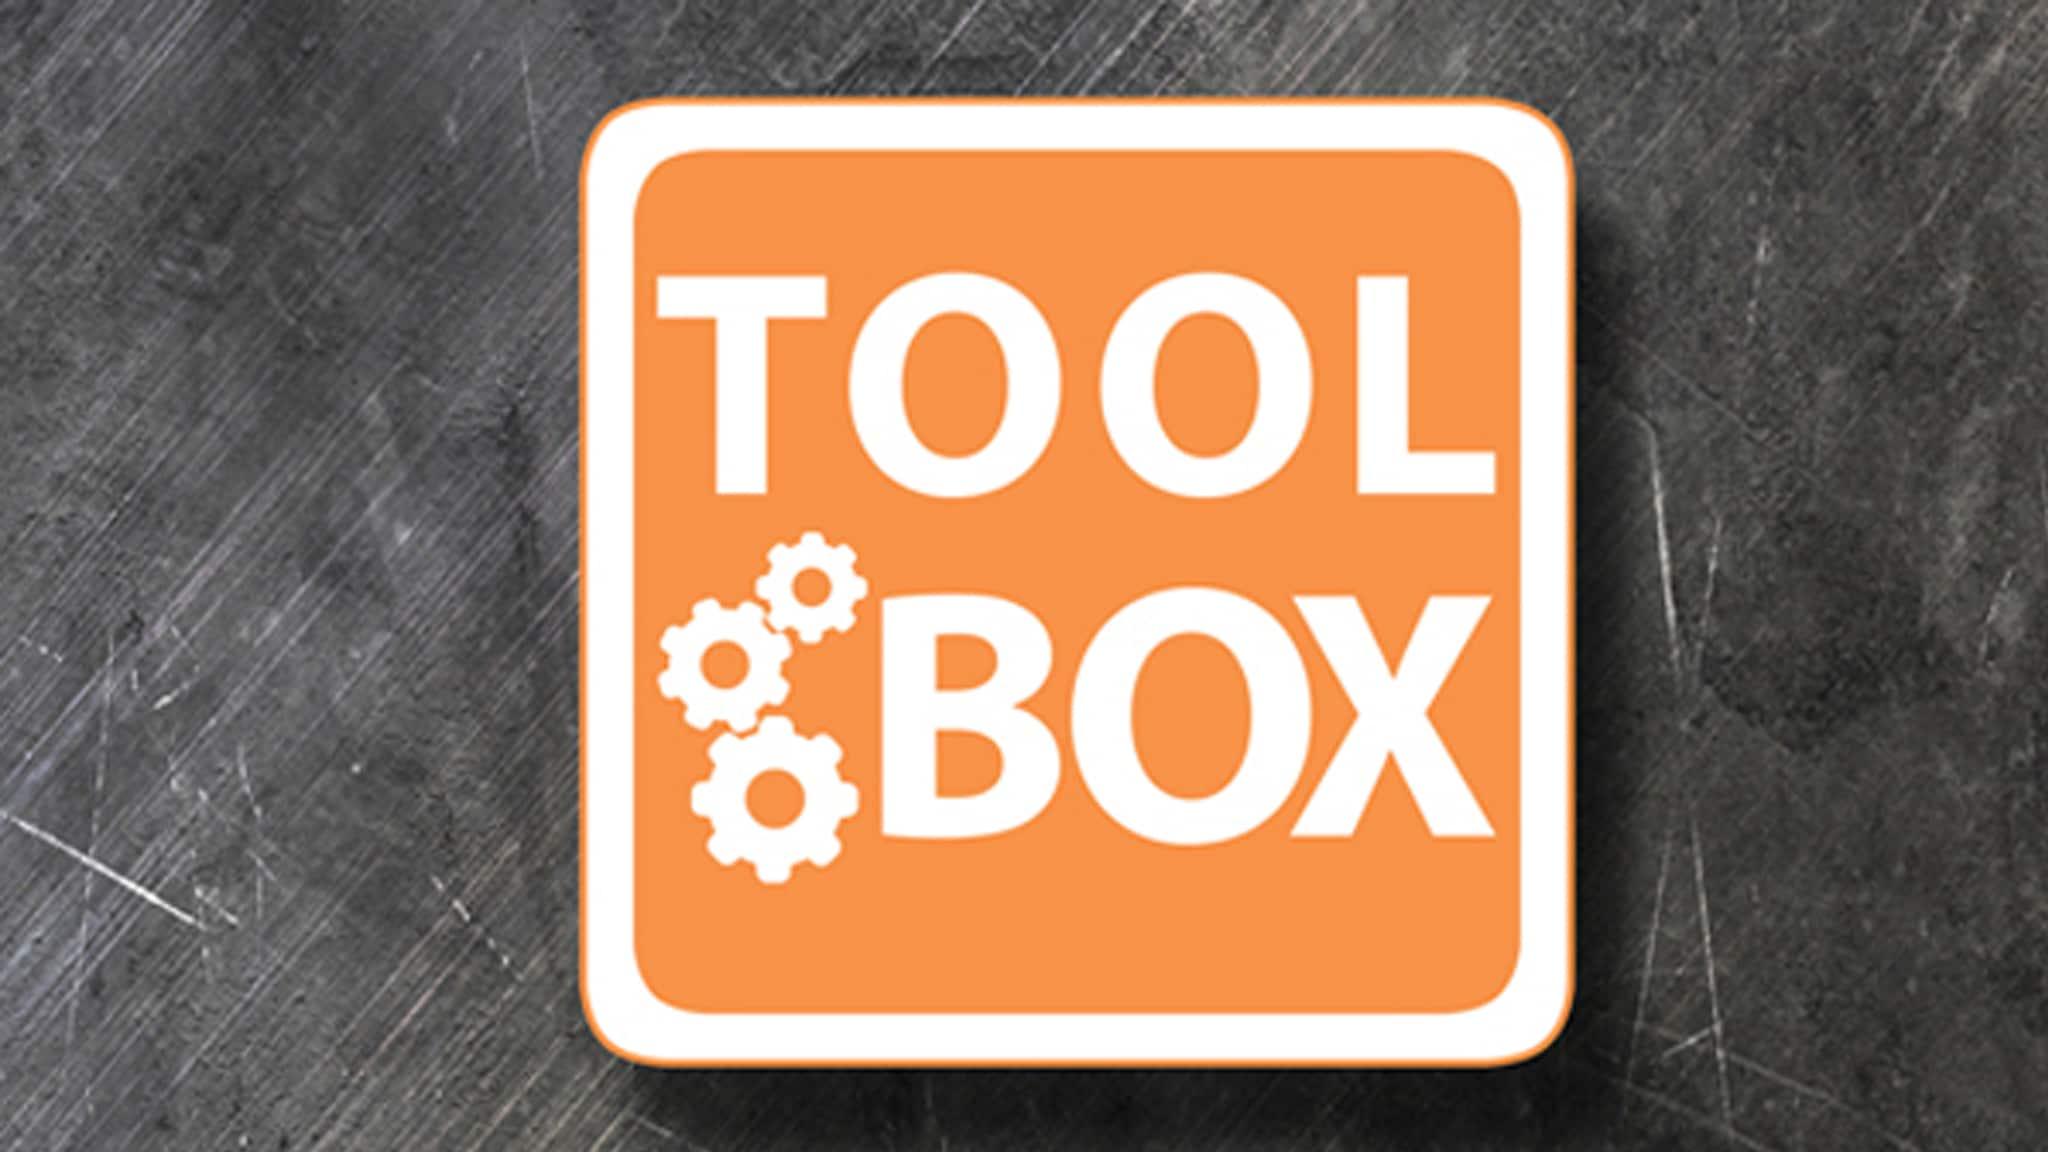 Toolbox II - Coding - p. 9 Insegnanti - Debugging